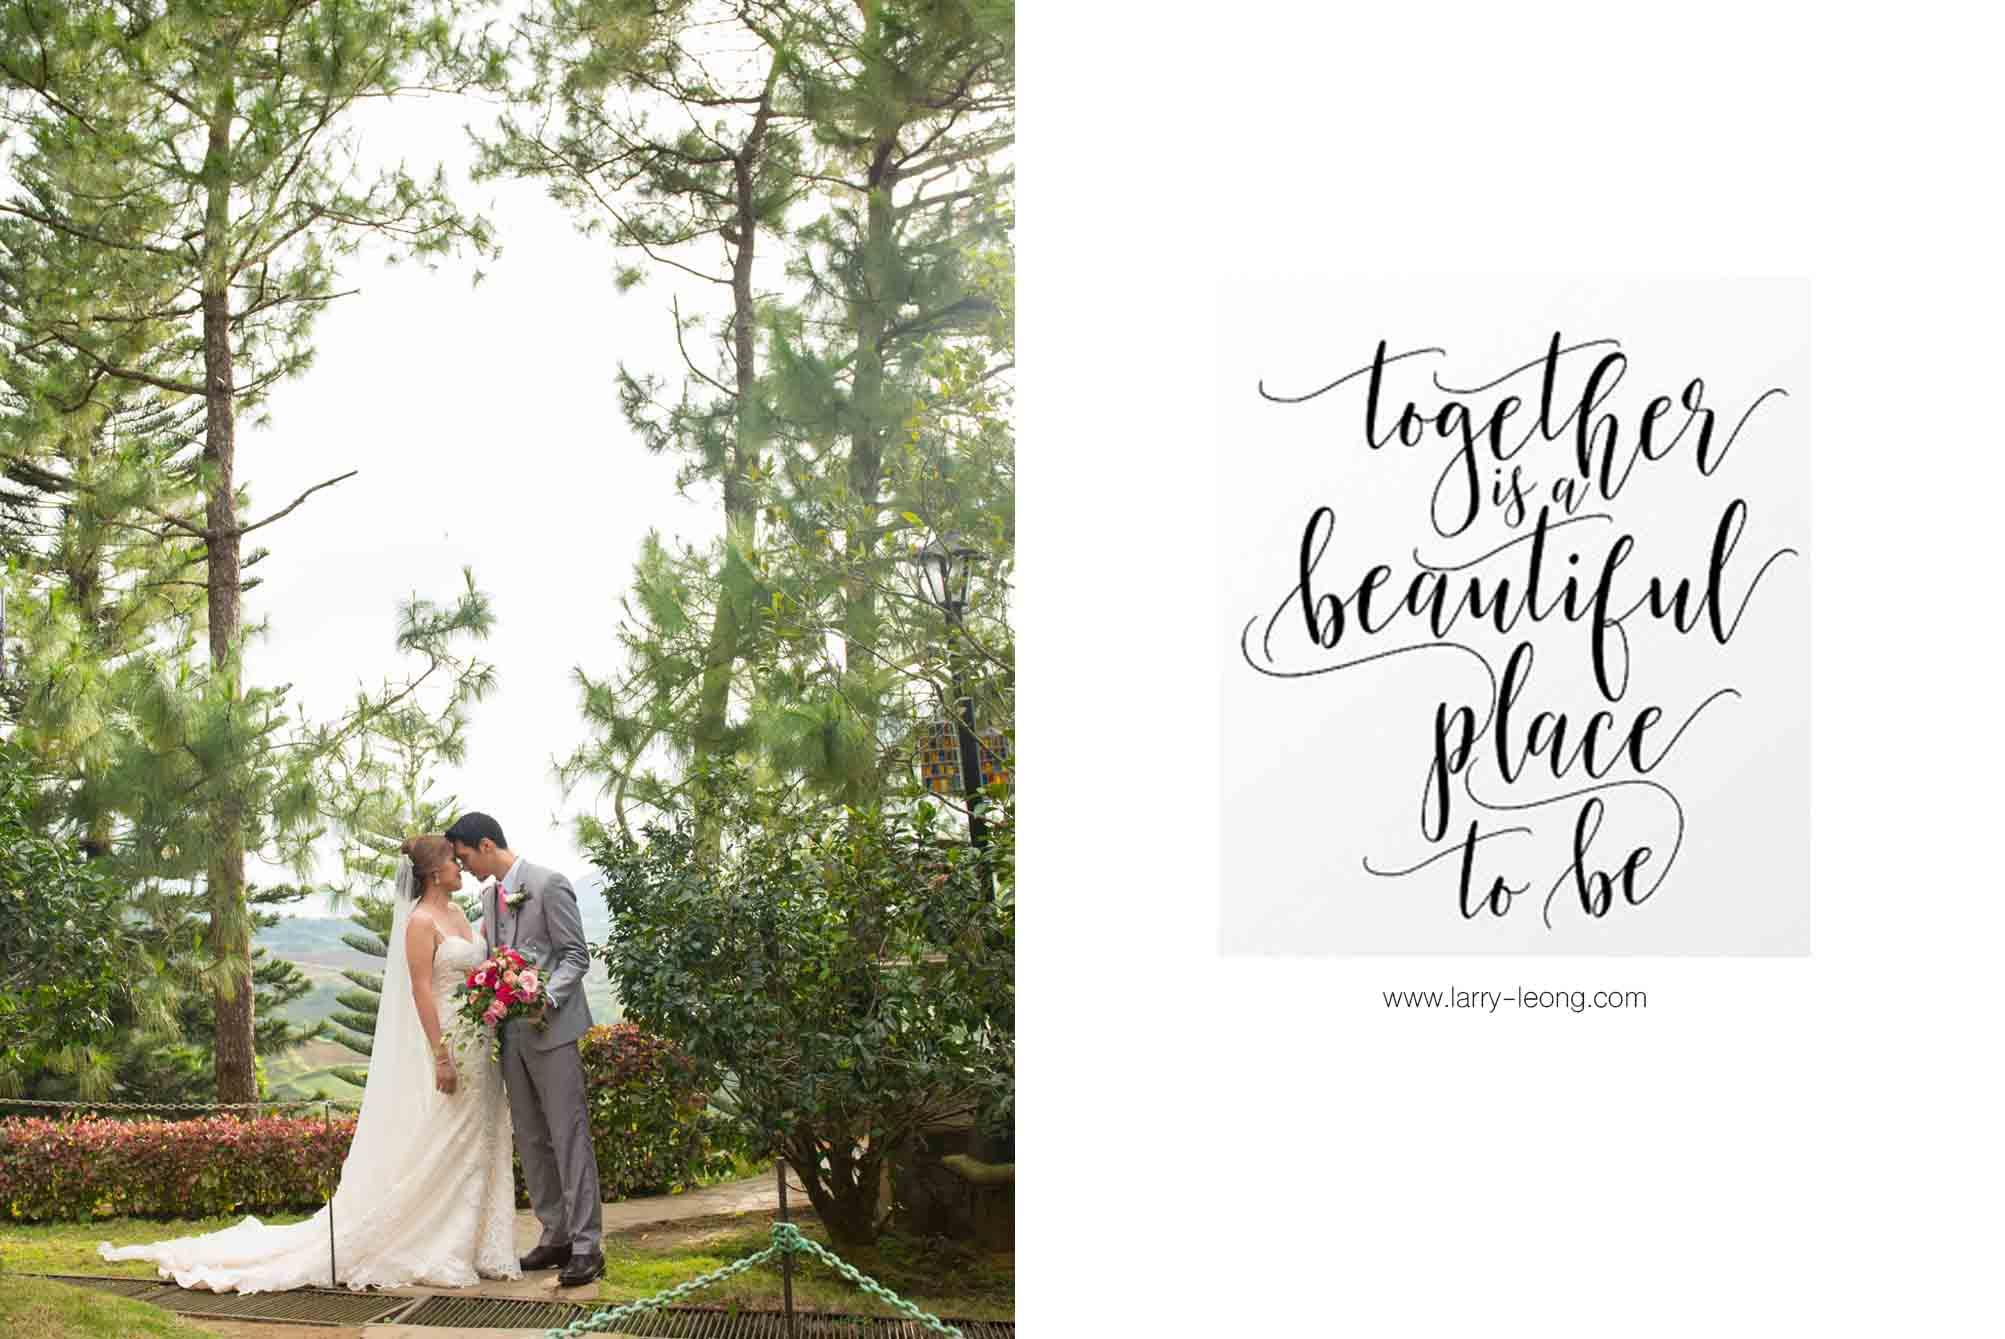 Wedding Photography Rate: Jomas & Ays' Tagaytay Wedding